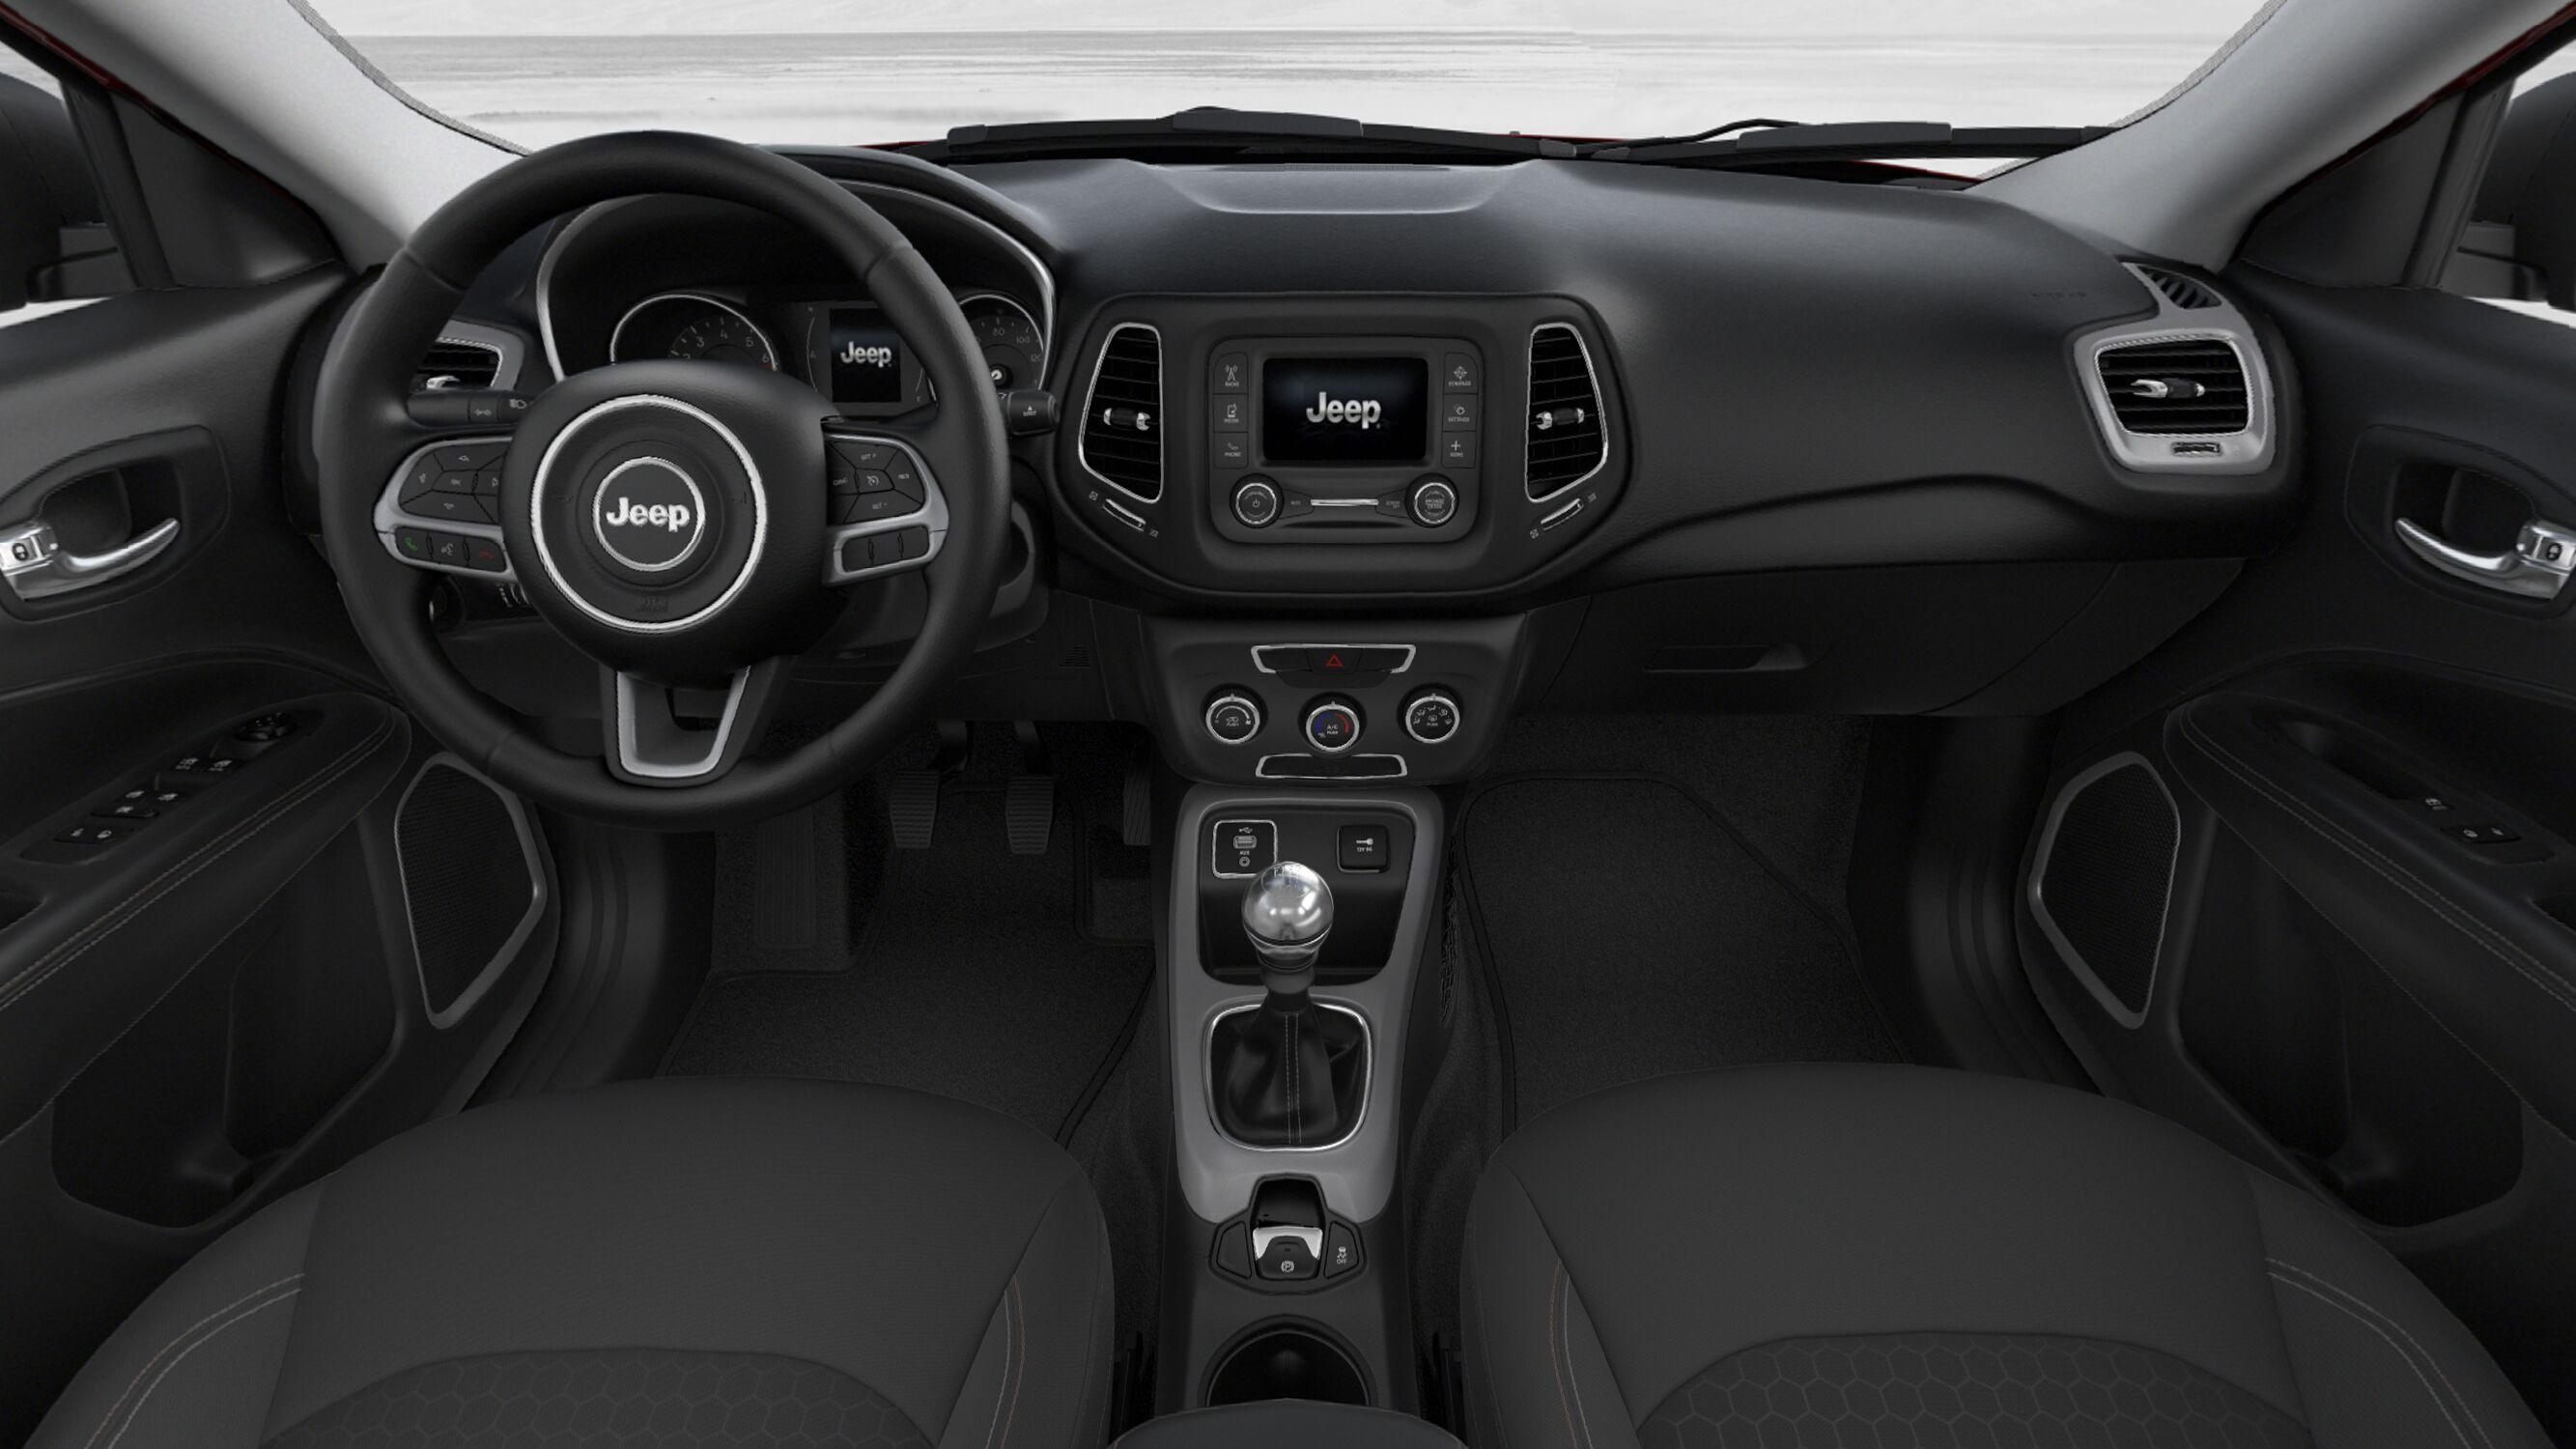 2018 jeep compass latitude vs sport trim mchenry il. Black Bedroom Furniture Sets. Home Design Ideas